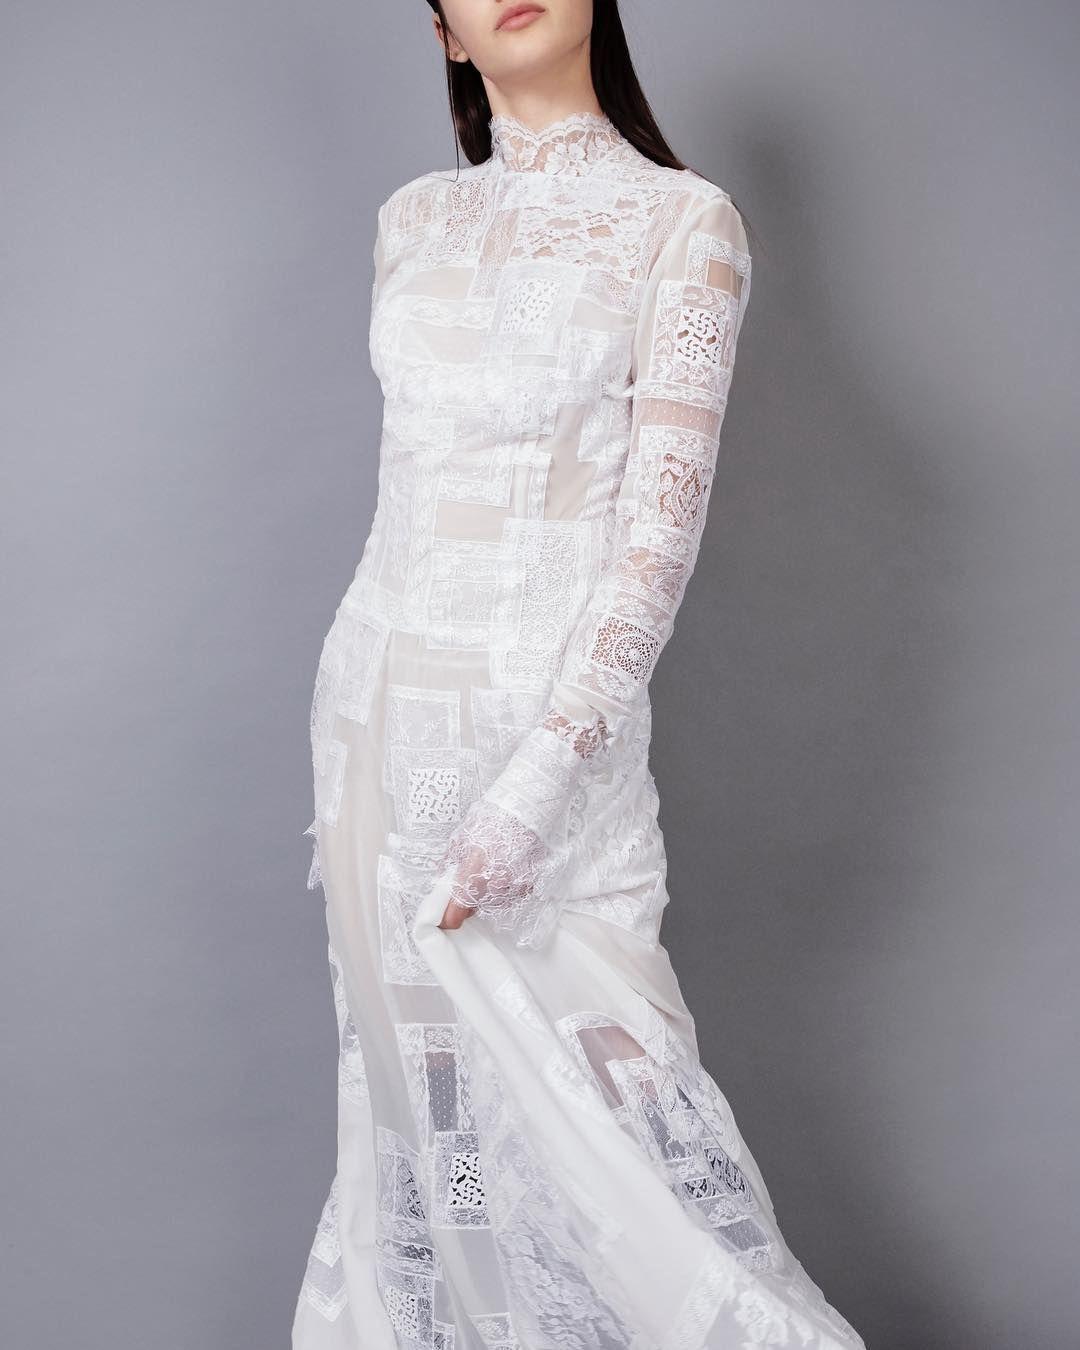 White Lace Eyelash Trim Transparent Beach Maxi Dress Shein Sheinside Beach Maxi Dress White Long Sleeve Dress Maxi Dress [ 1883 x 1413 Pixel ]